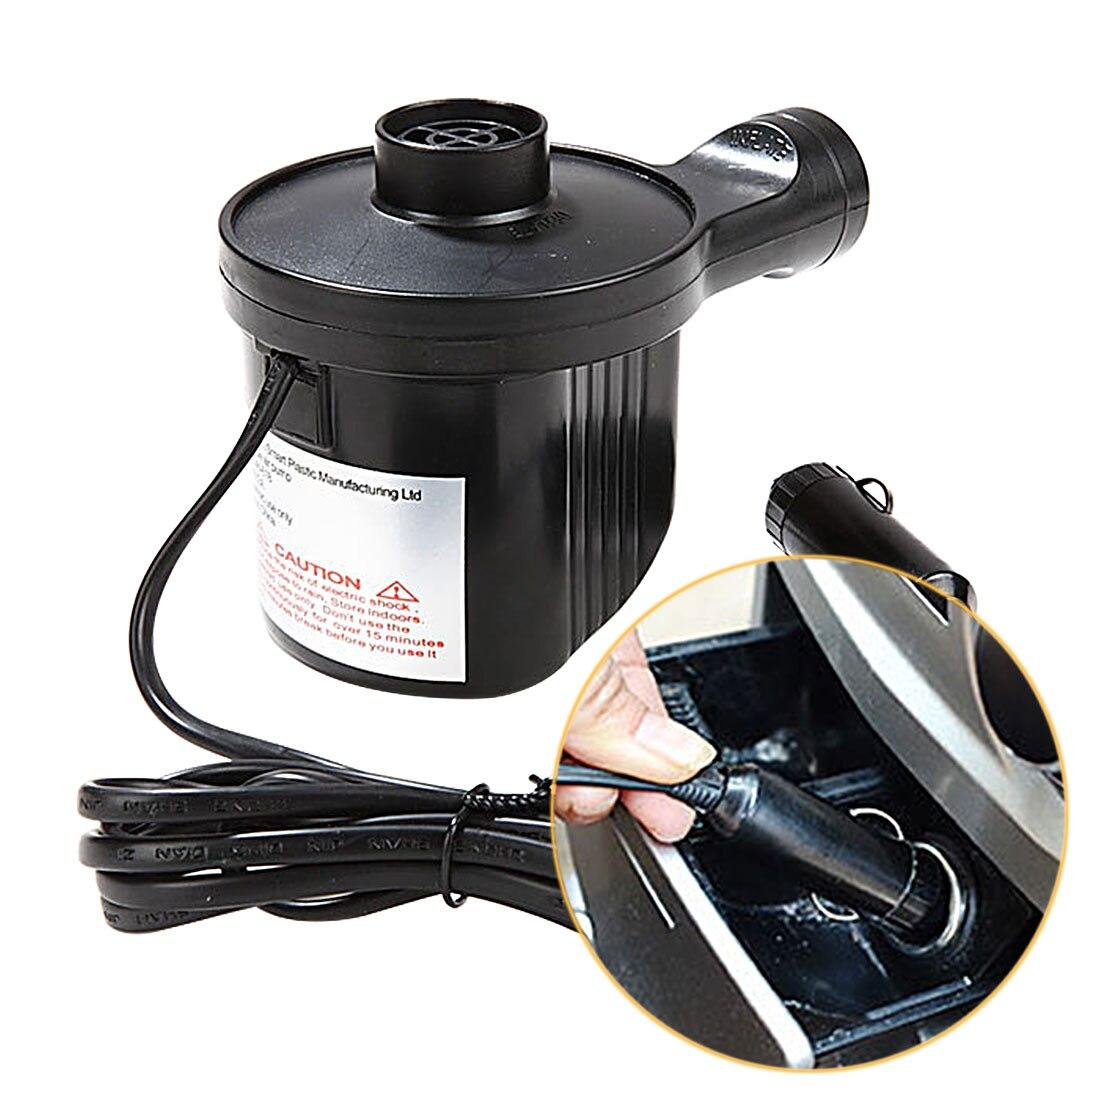 Dewtreetali Vehicle mounted electric inflator pump, motor driven air pump, on-board electric pump, car mounted air pump